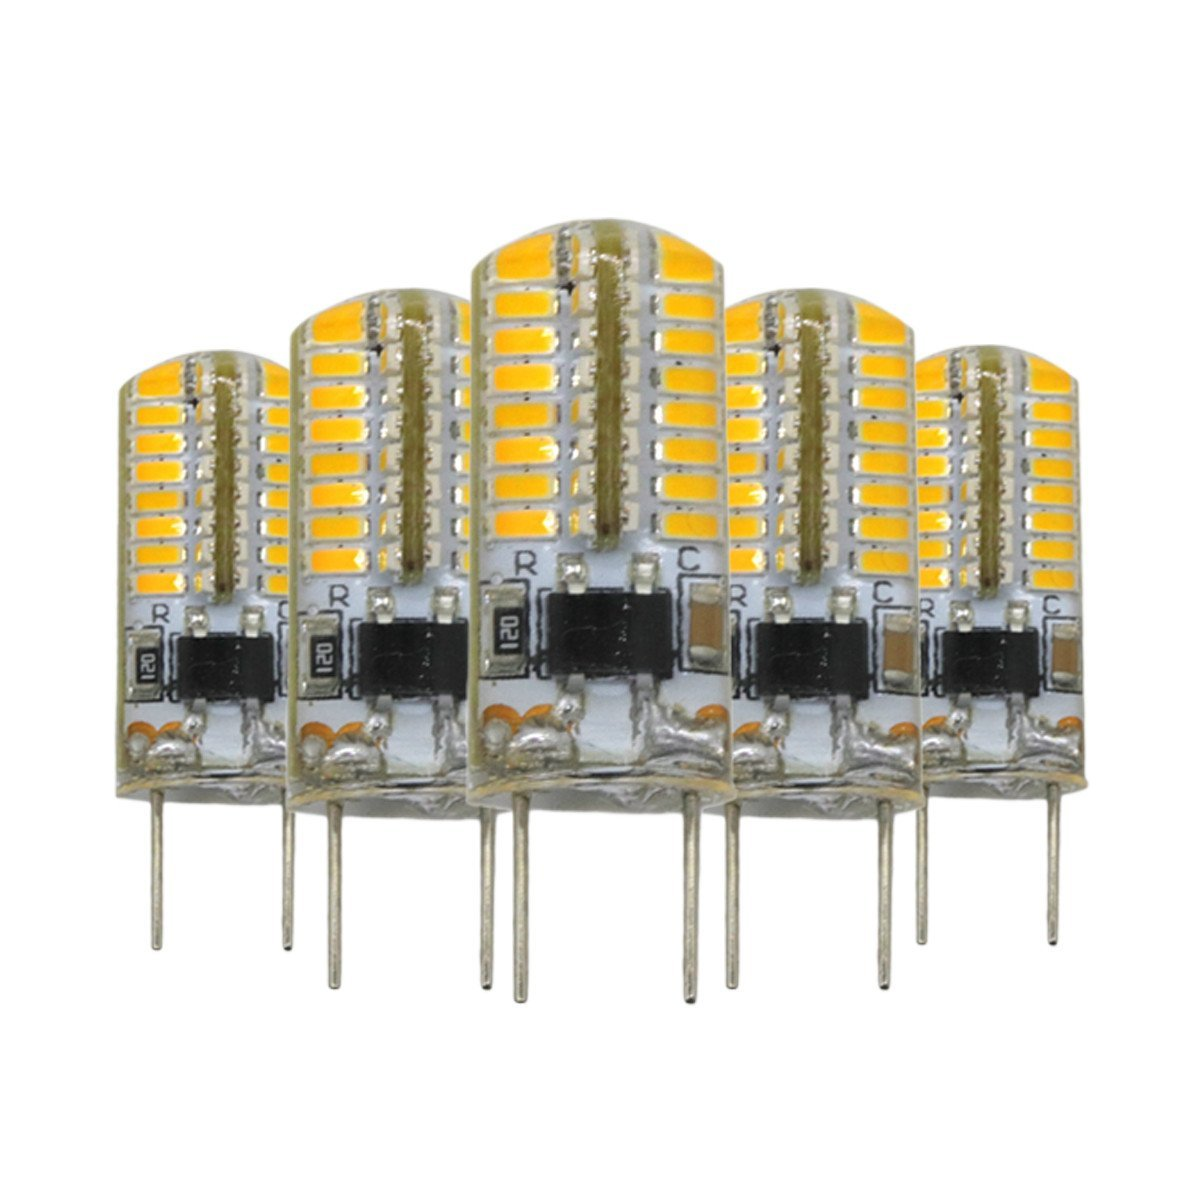 Wunderbar BMY Startseite Led Lampen 5 STÜCKE G8 64 LED 3014SMD 3 Watt 200 300 Lm  Warmweiß Dimmbare ...